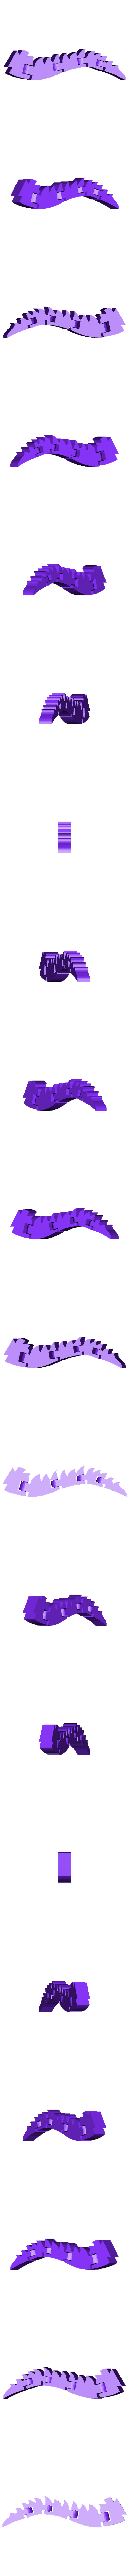 8b_Godzilla_Body_split_B_v2.stl Download free STL file Flexi Godzilla • 3D printable object, dancingchicken